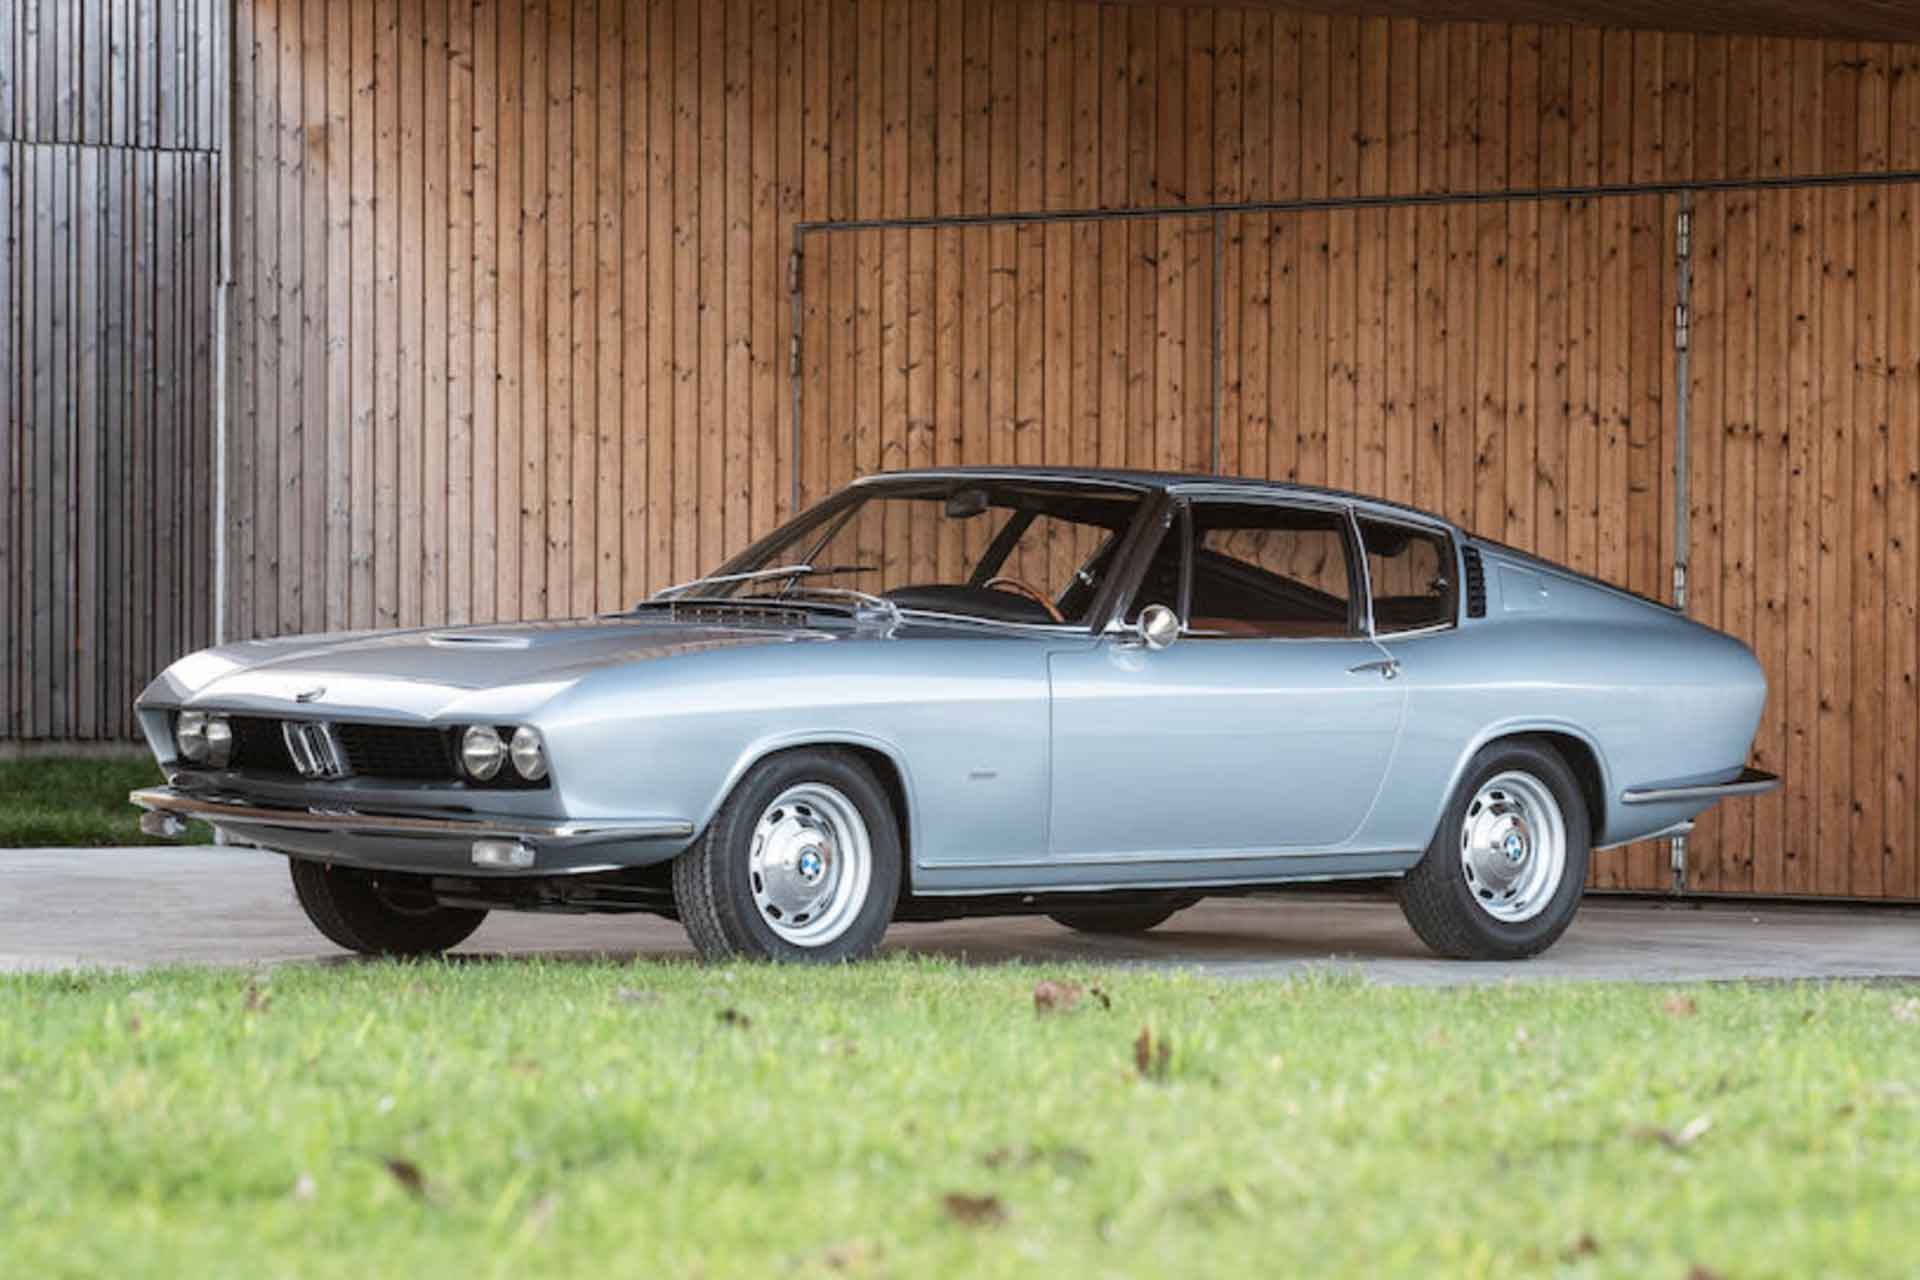 1967 BMW-Glas 3000 V8 Fastback Coupé Prototype